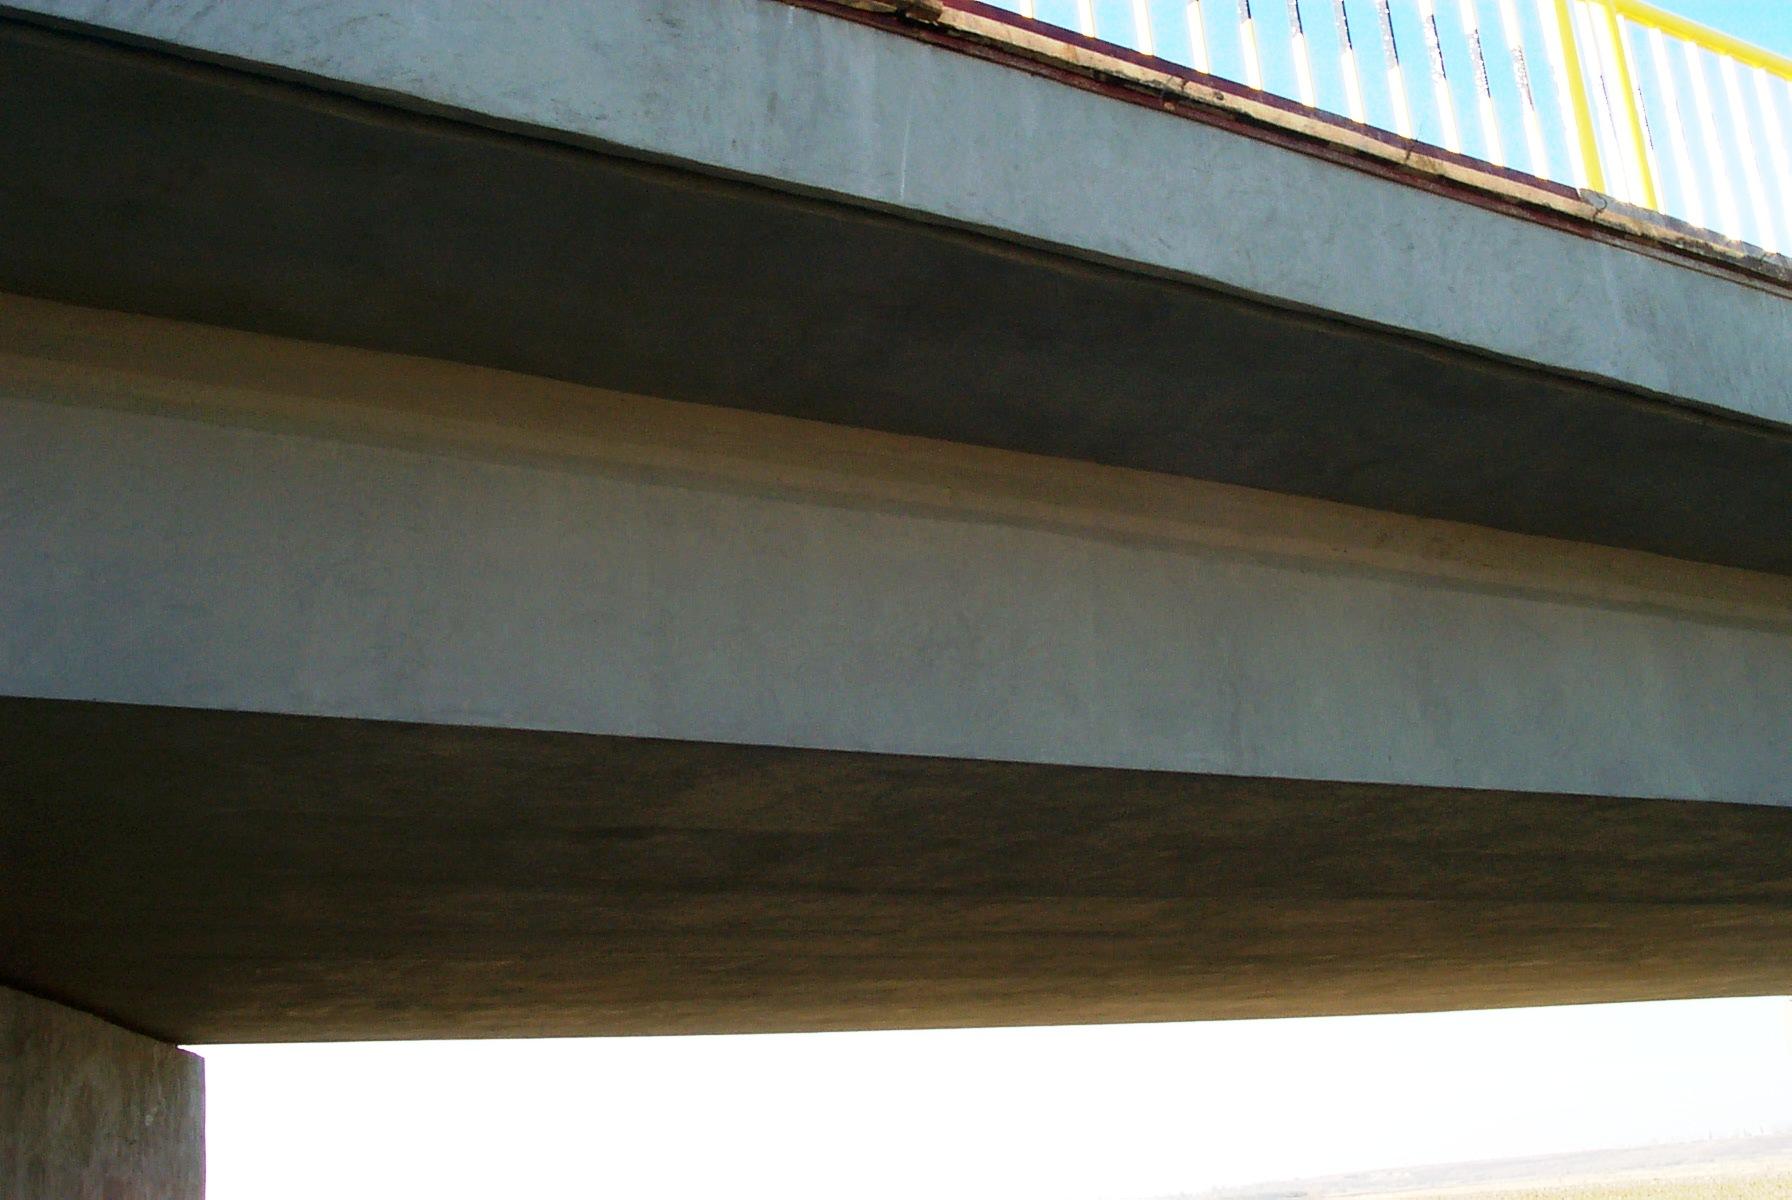 Reparatii pod (DN2), Km. 33 - 028, peste raul Calnistea MAPEI - Poza 20